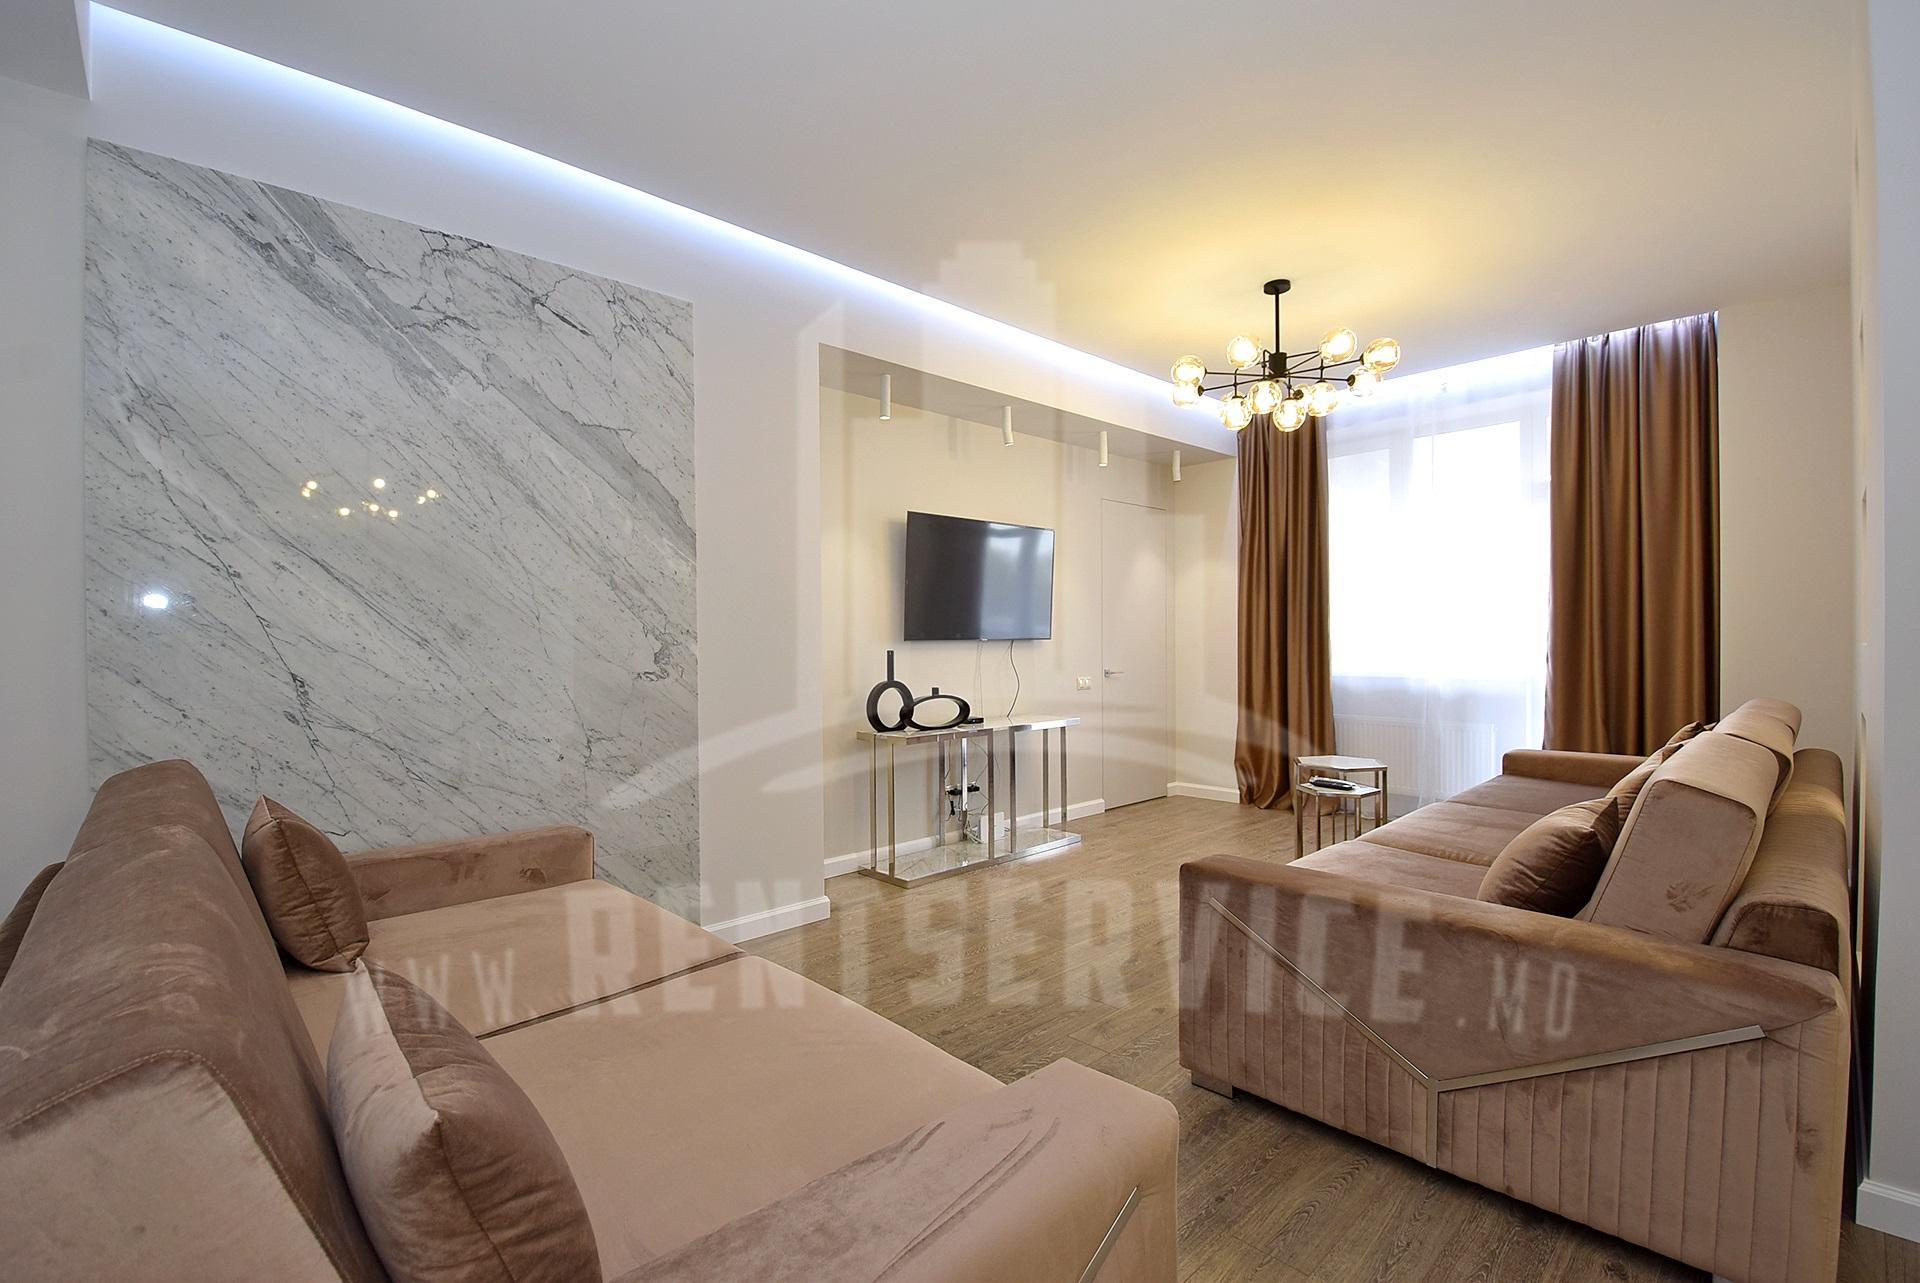 285_apartment_2.JPG